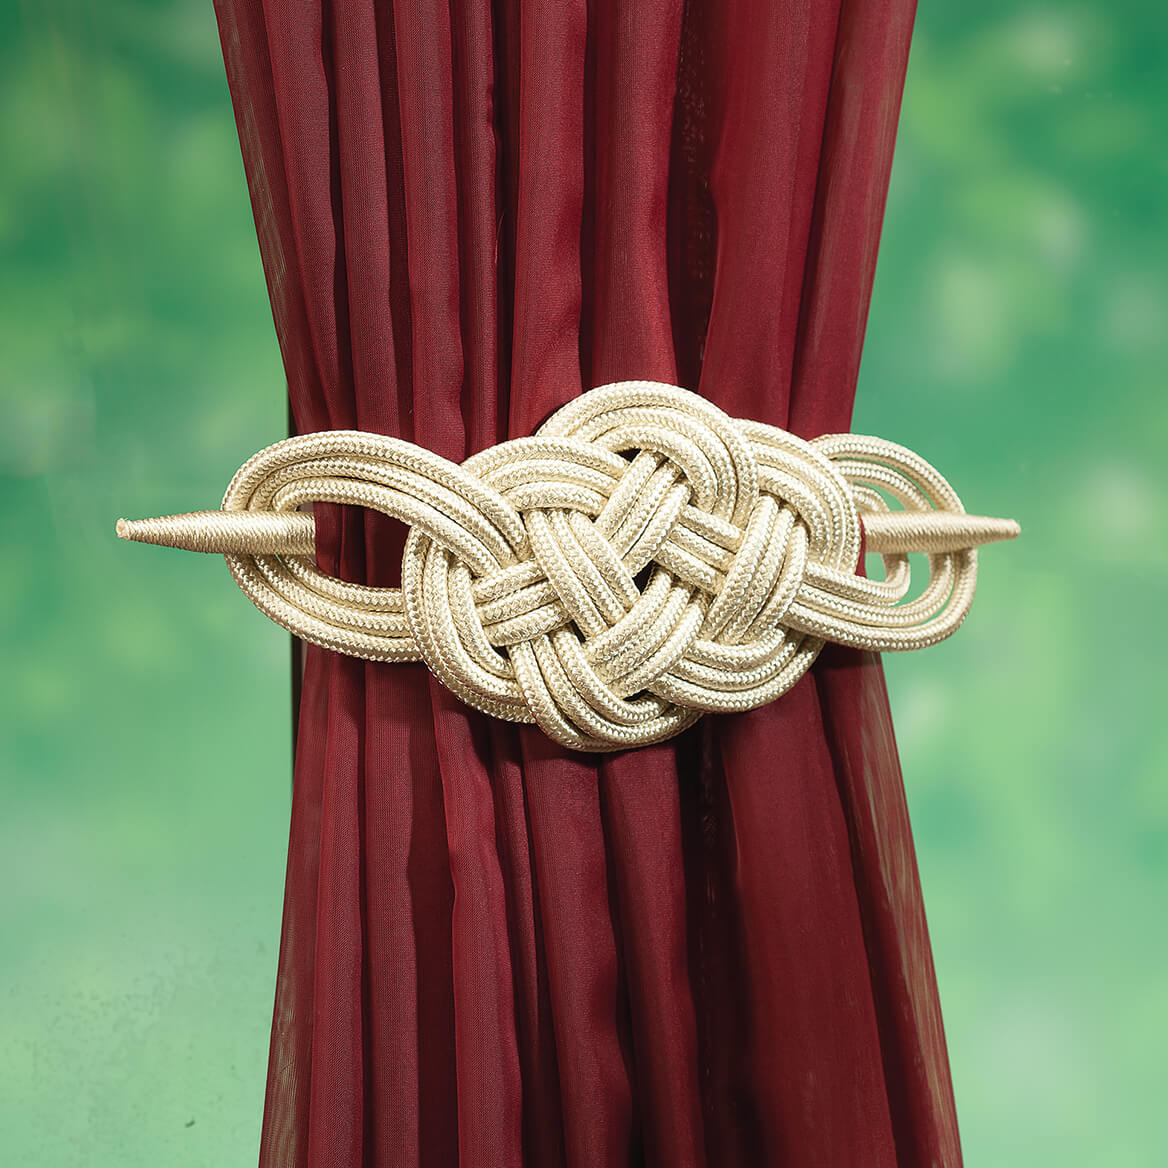 Braided Curtain Tie-Backs, Set of 2-365682